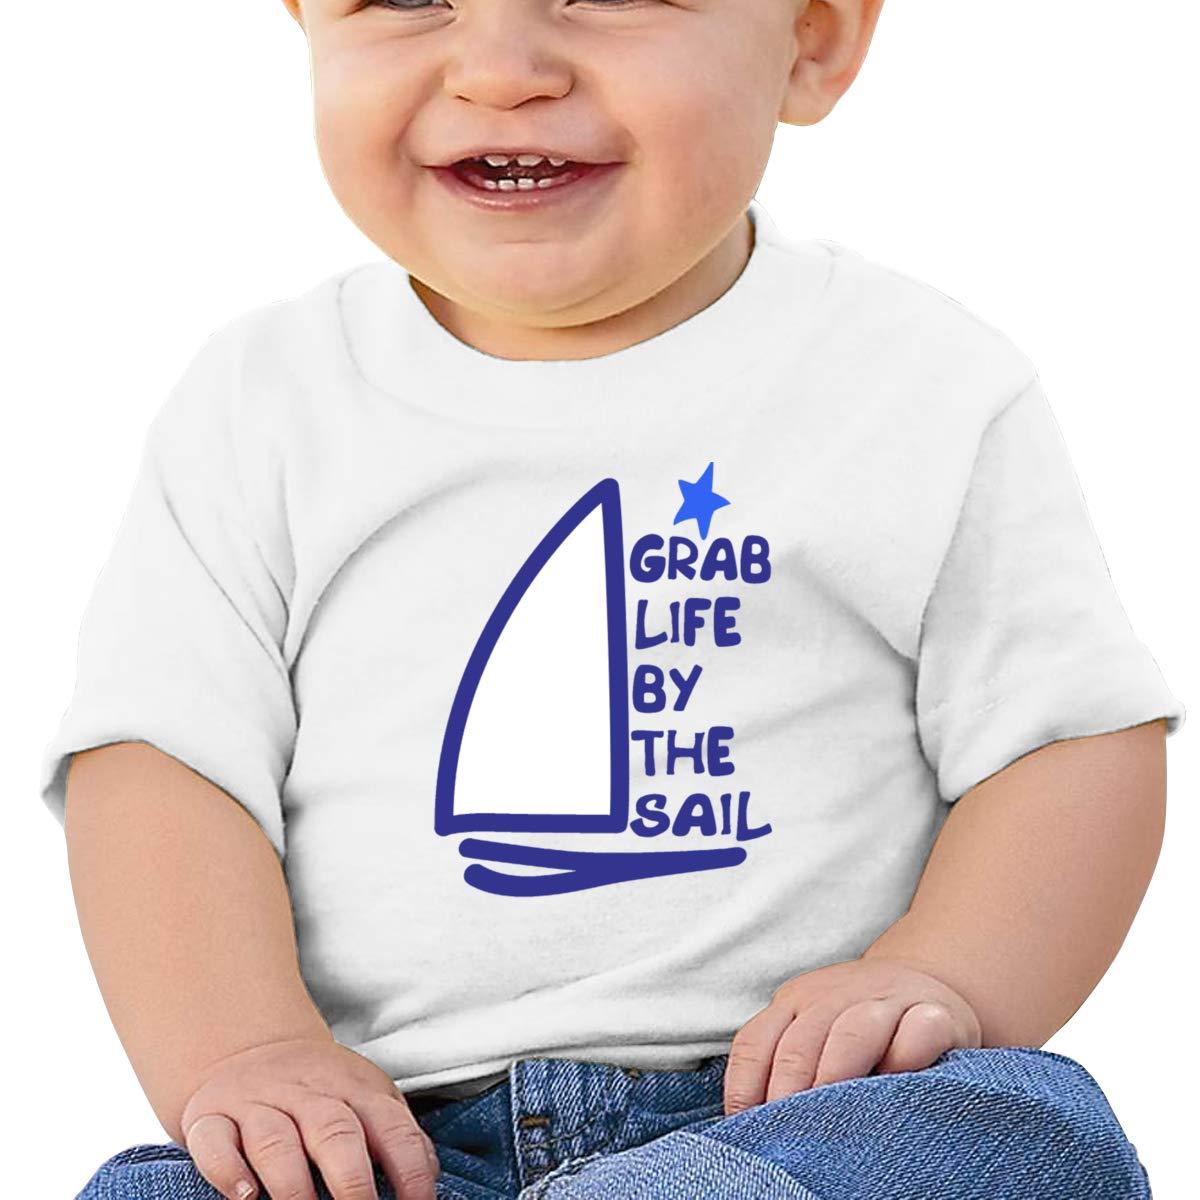 Qiop Nee Grab Life by The Sailing Short-Sleeve Shirts Baby Girls